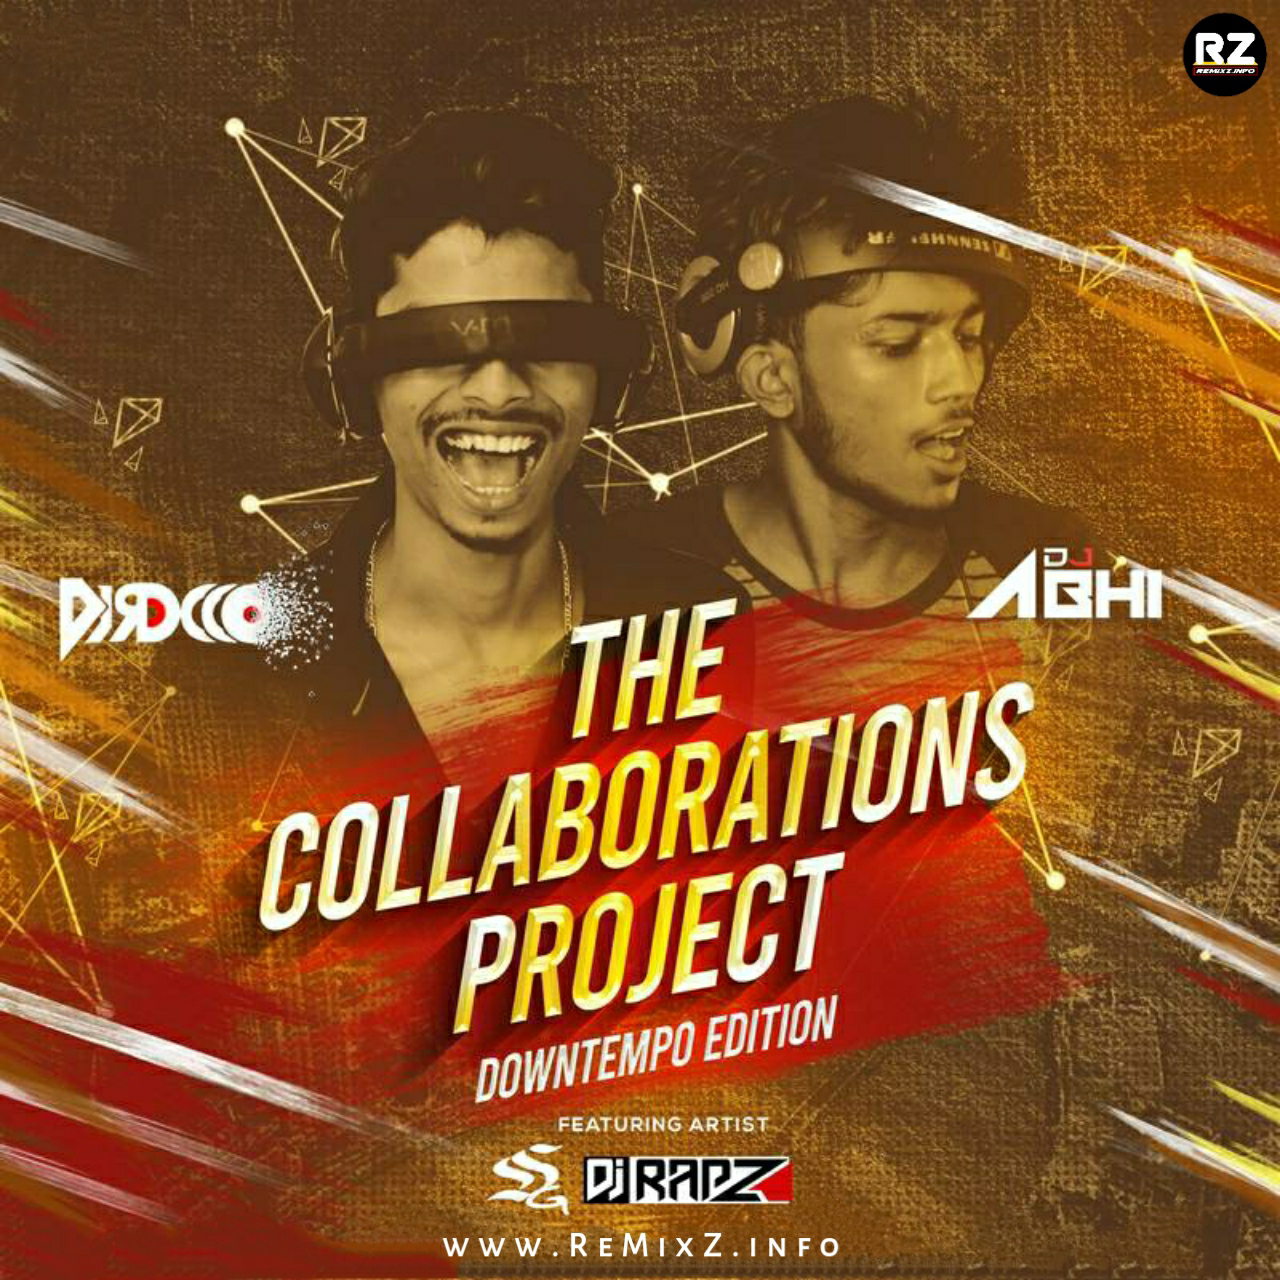 The-Collaborations-Project-DJ-Abhi-X-DJ-Rocco.jpg